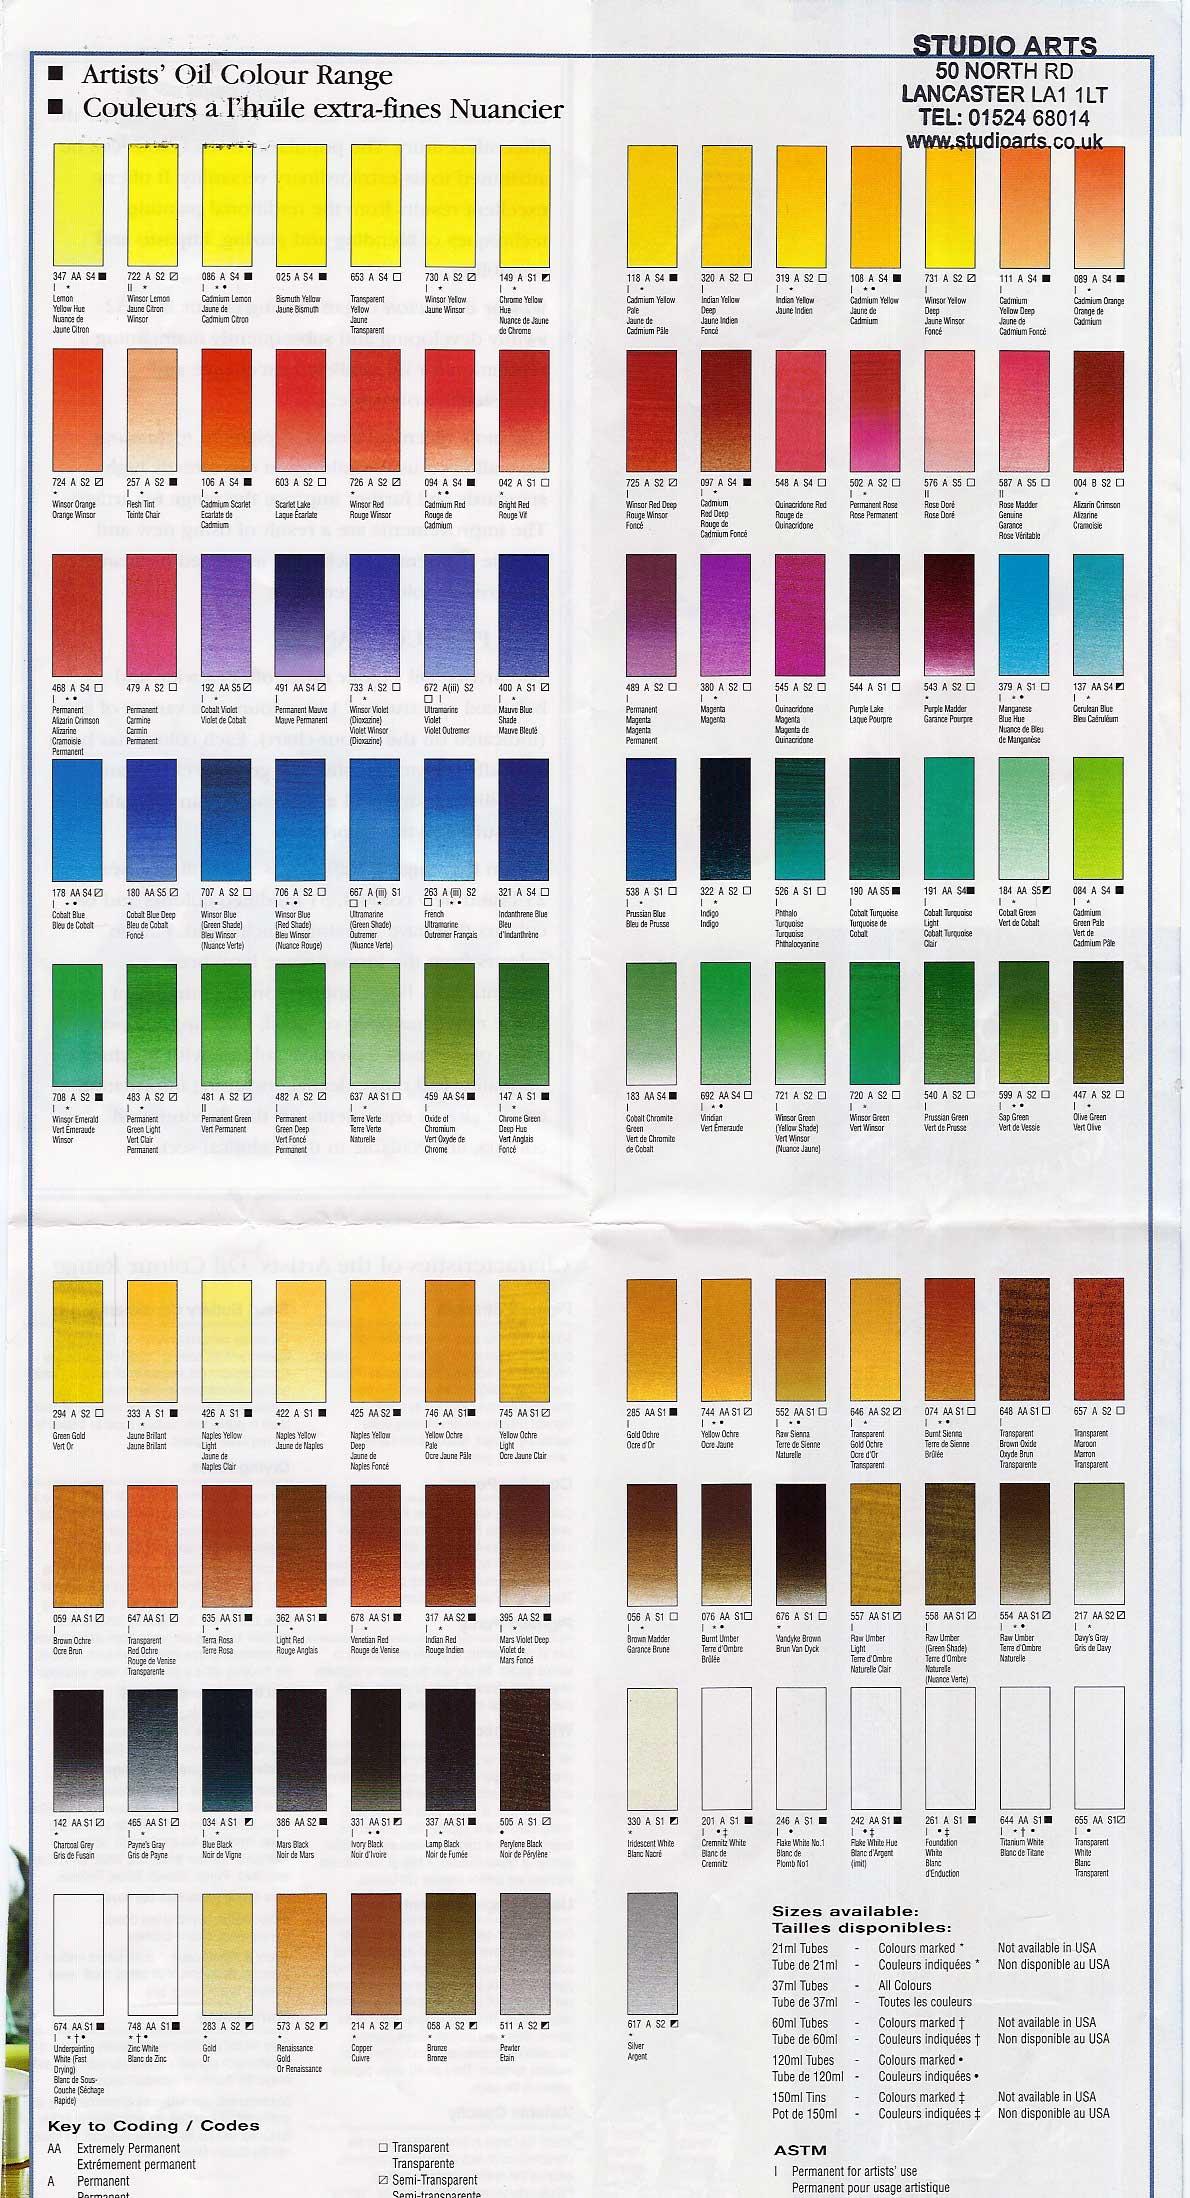 chart level oil colour: Studio arts crafts and graphics titanium white opaque artist oil